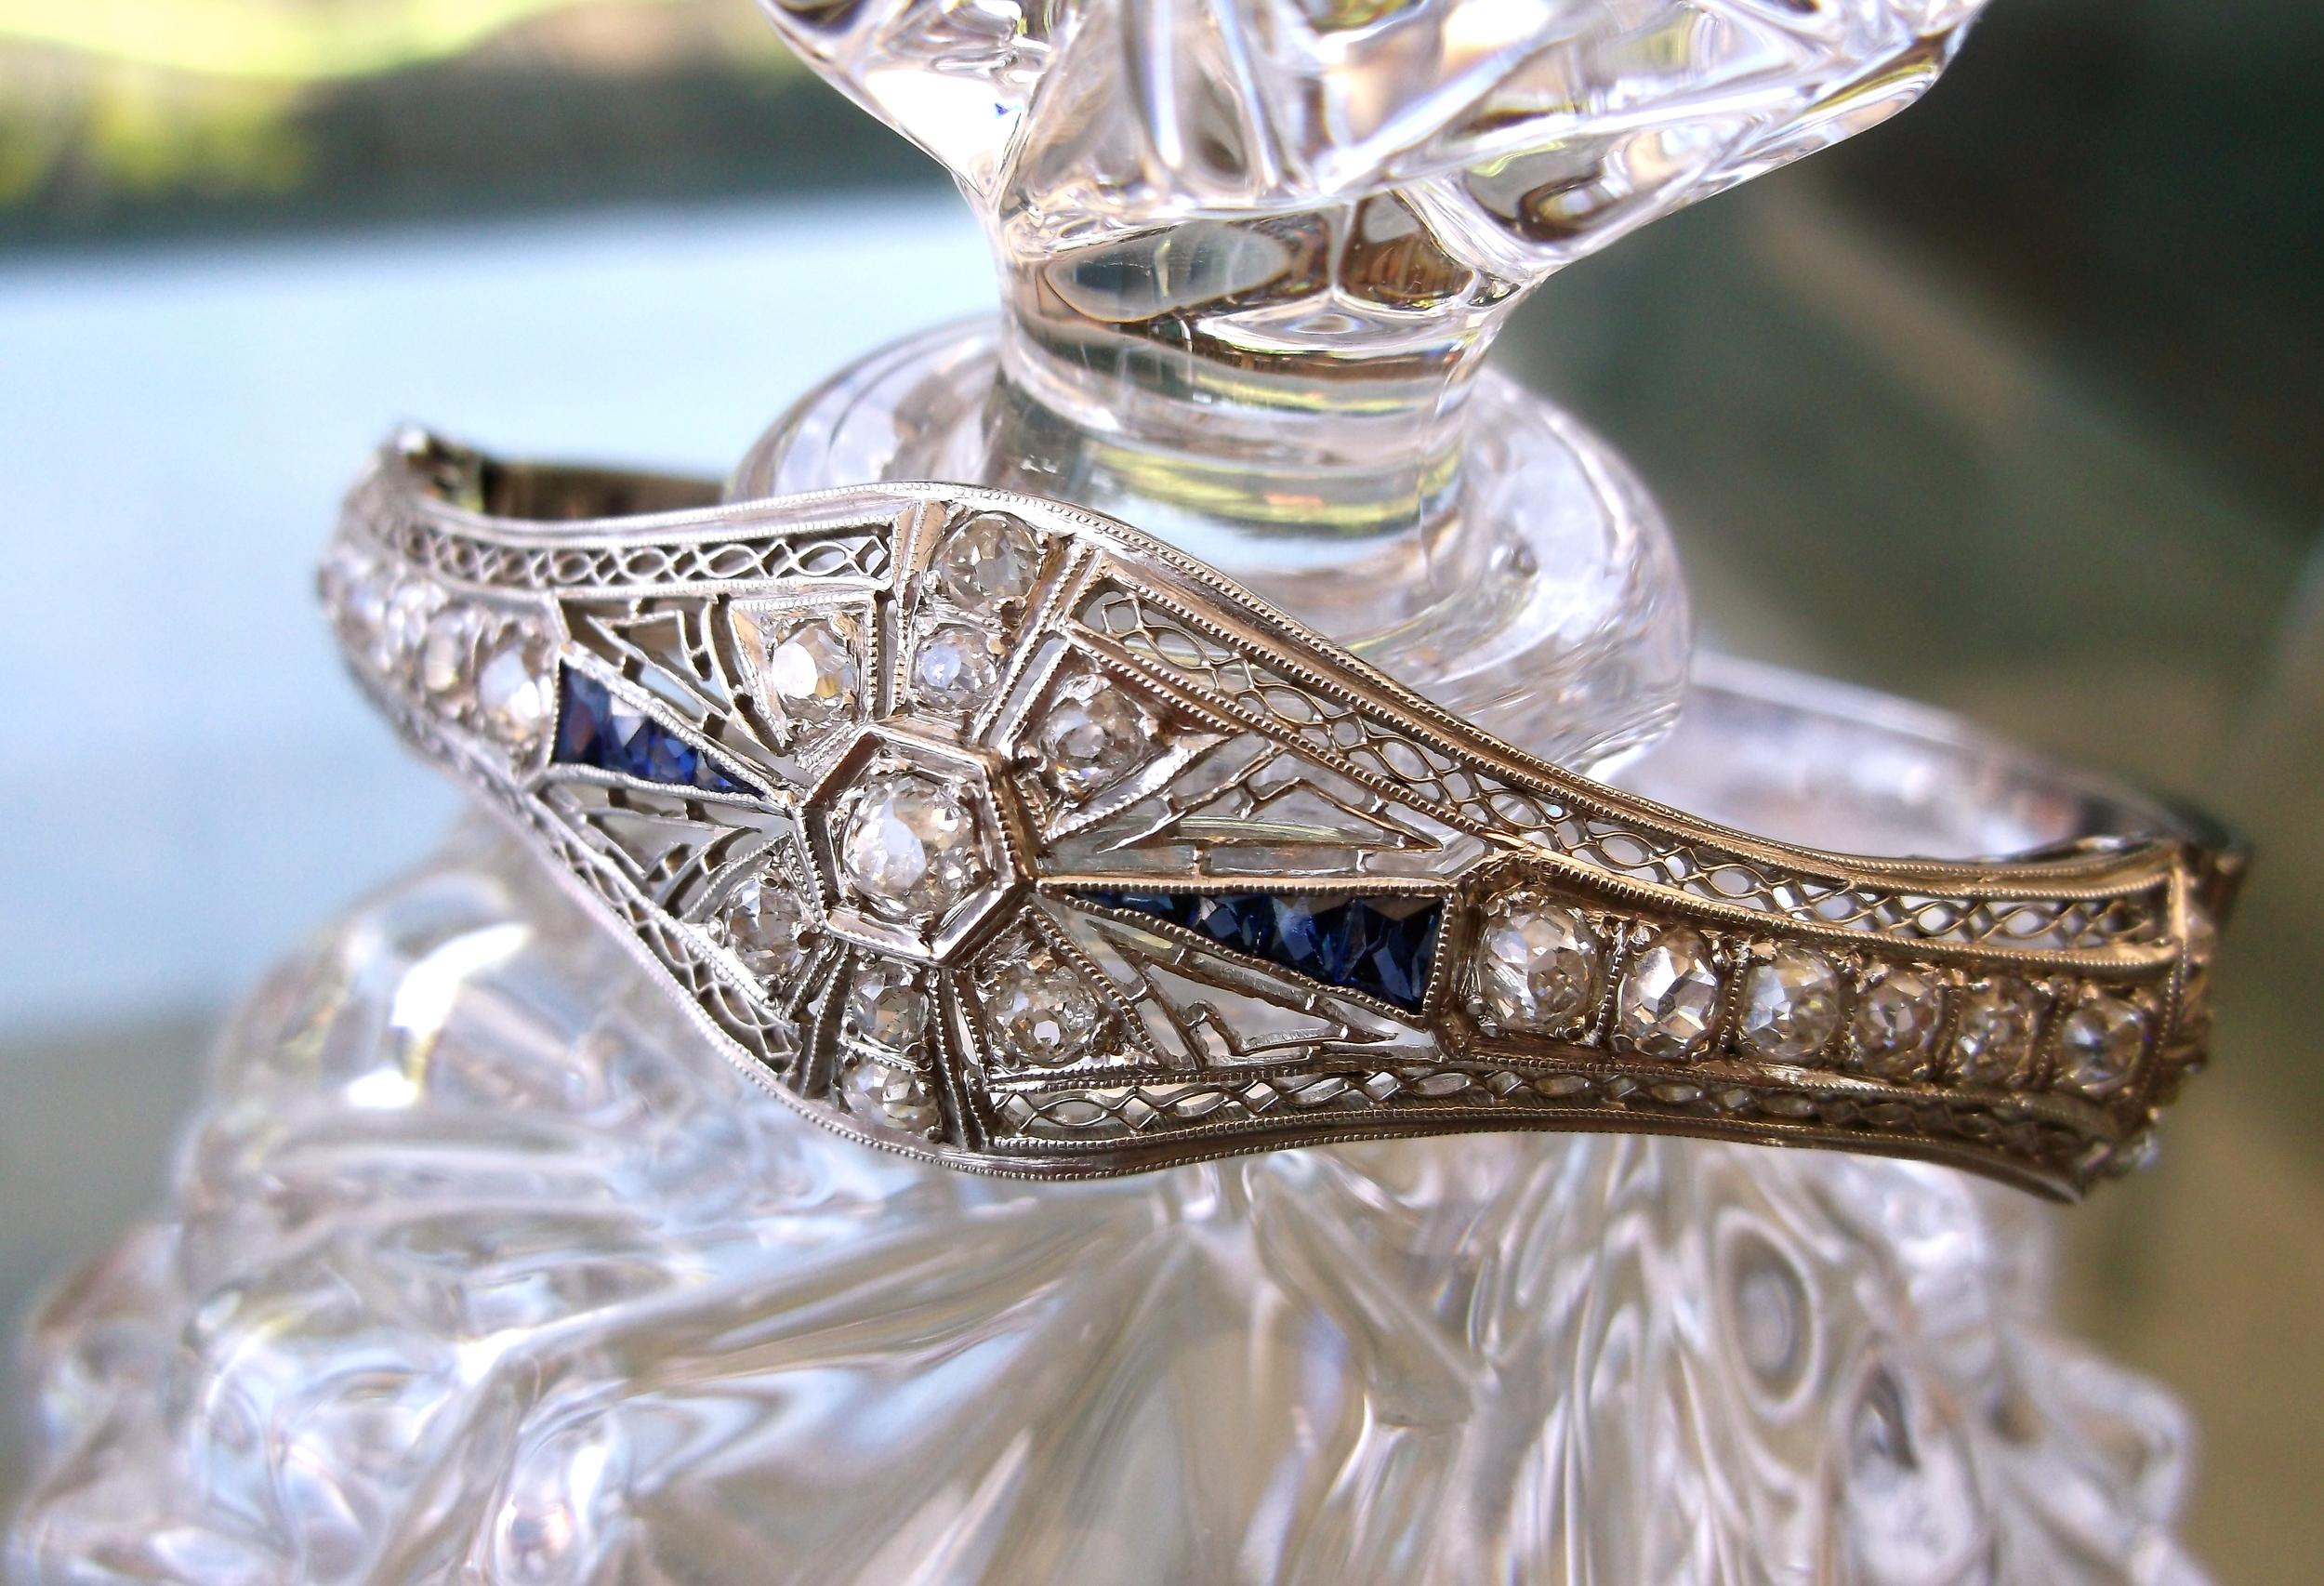 SOLD -Gorgeous Art Deco diamond and sapphire bangle bracelet set in white gold.